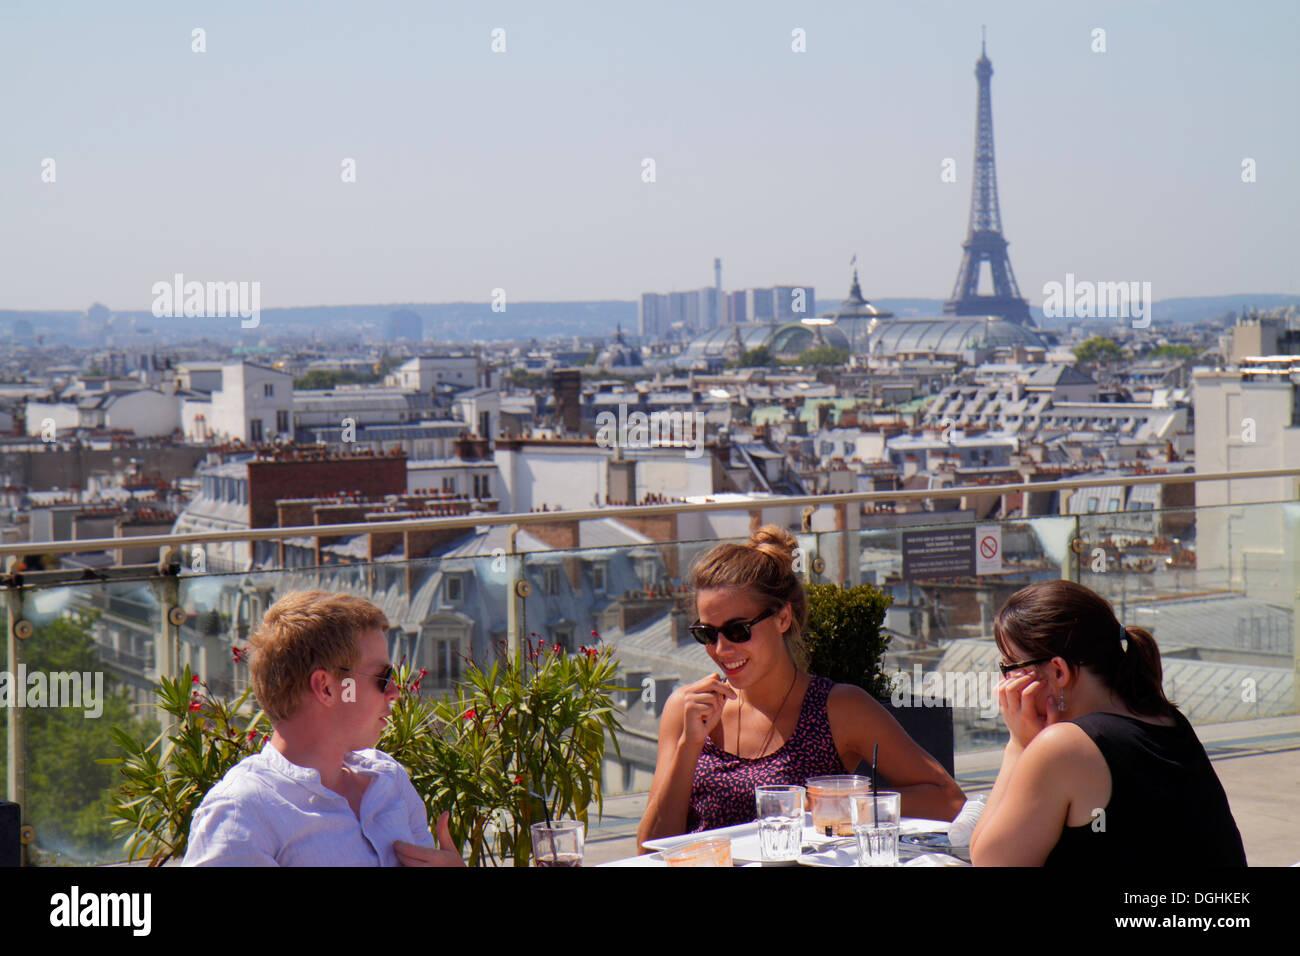 paris france europe french 9th arrondissement boulevard haussmann au stock photo royalty free. Black Bedroom Furniture Sets. Home Design Ideas